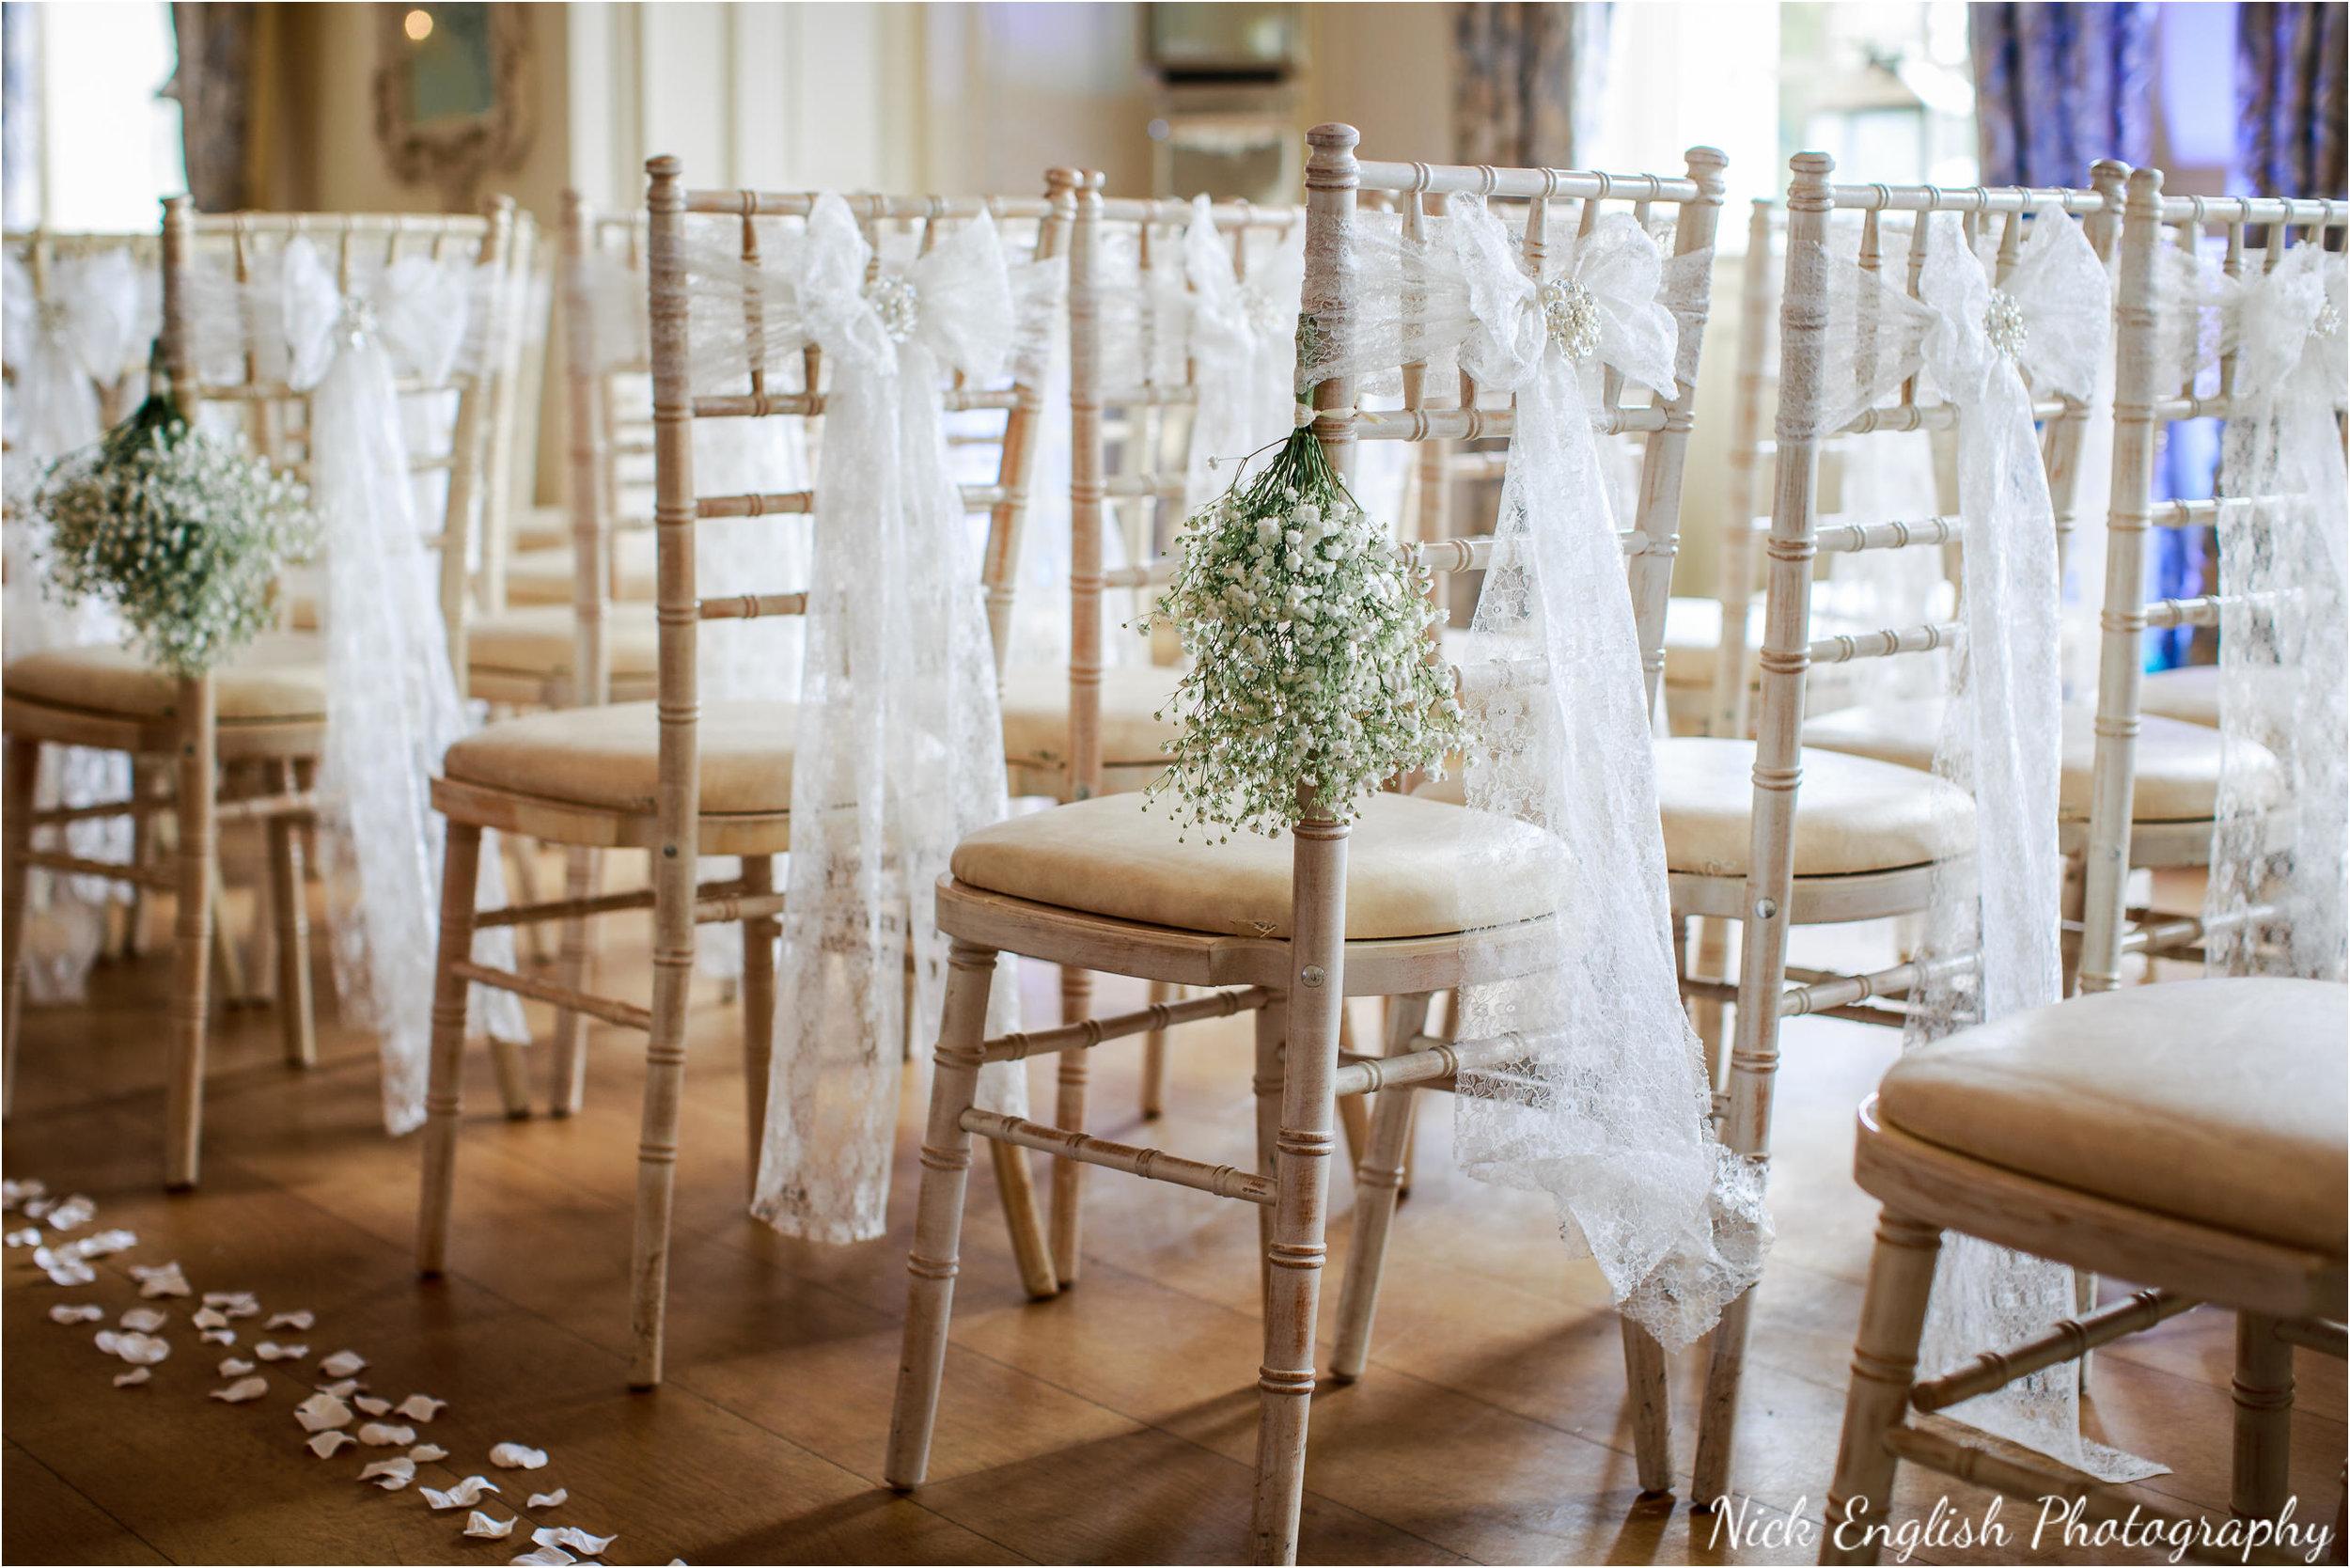 Alison James Wedding Photographs at Eaves Hall West Bradford 36jpg.jpeg